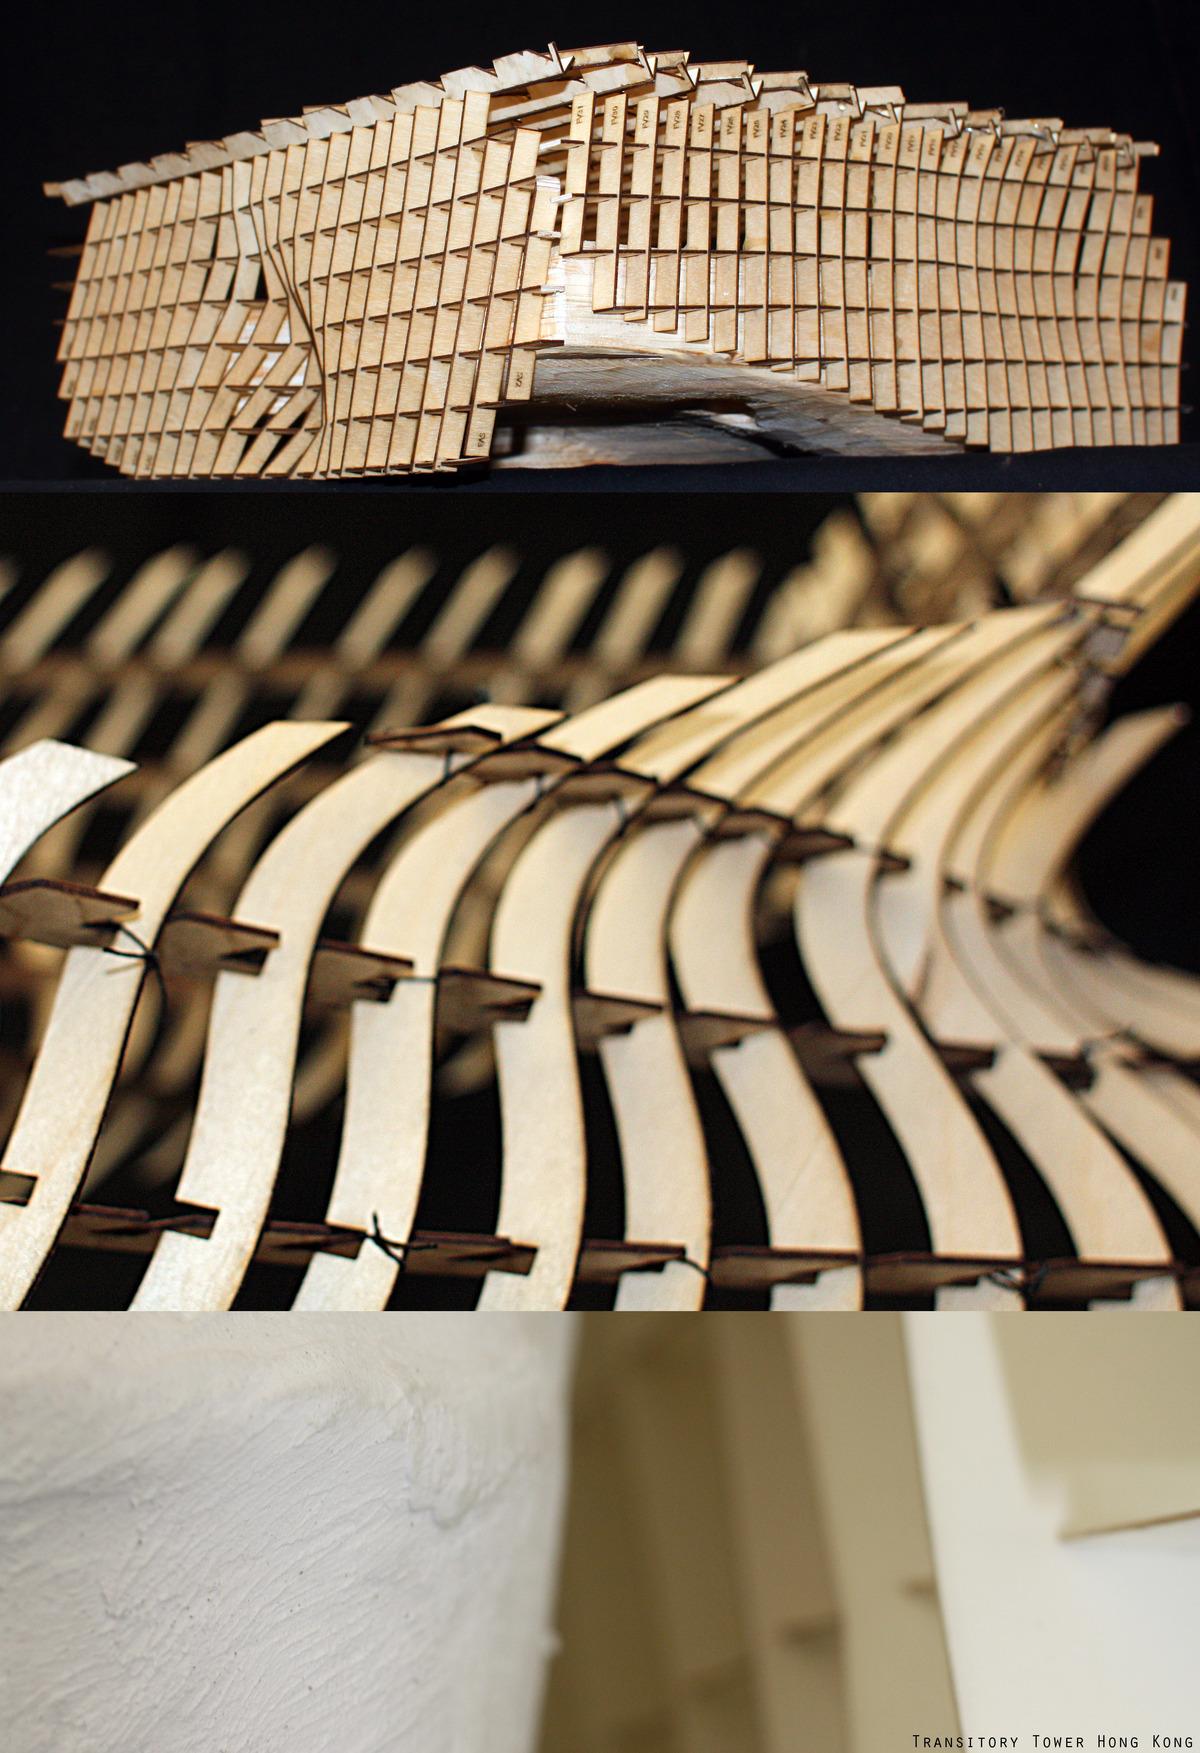 Parametric models _ CNC and laser cut. 1: precedent (Broad Museum) 2: transformation 3: final model (6 tall)